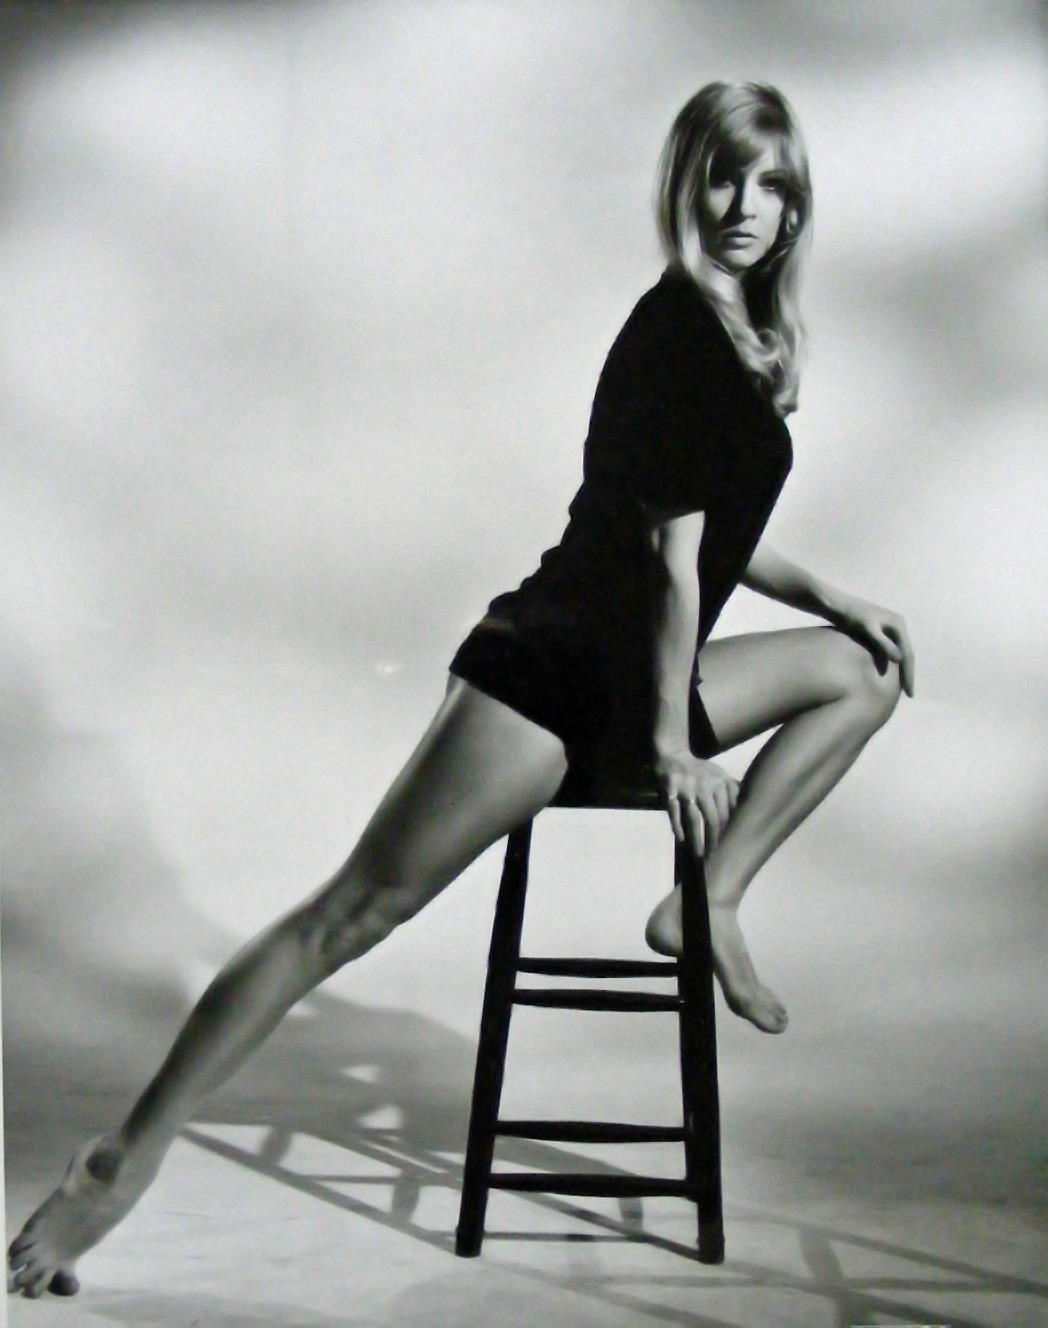 Vicki Hodge's Feet